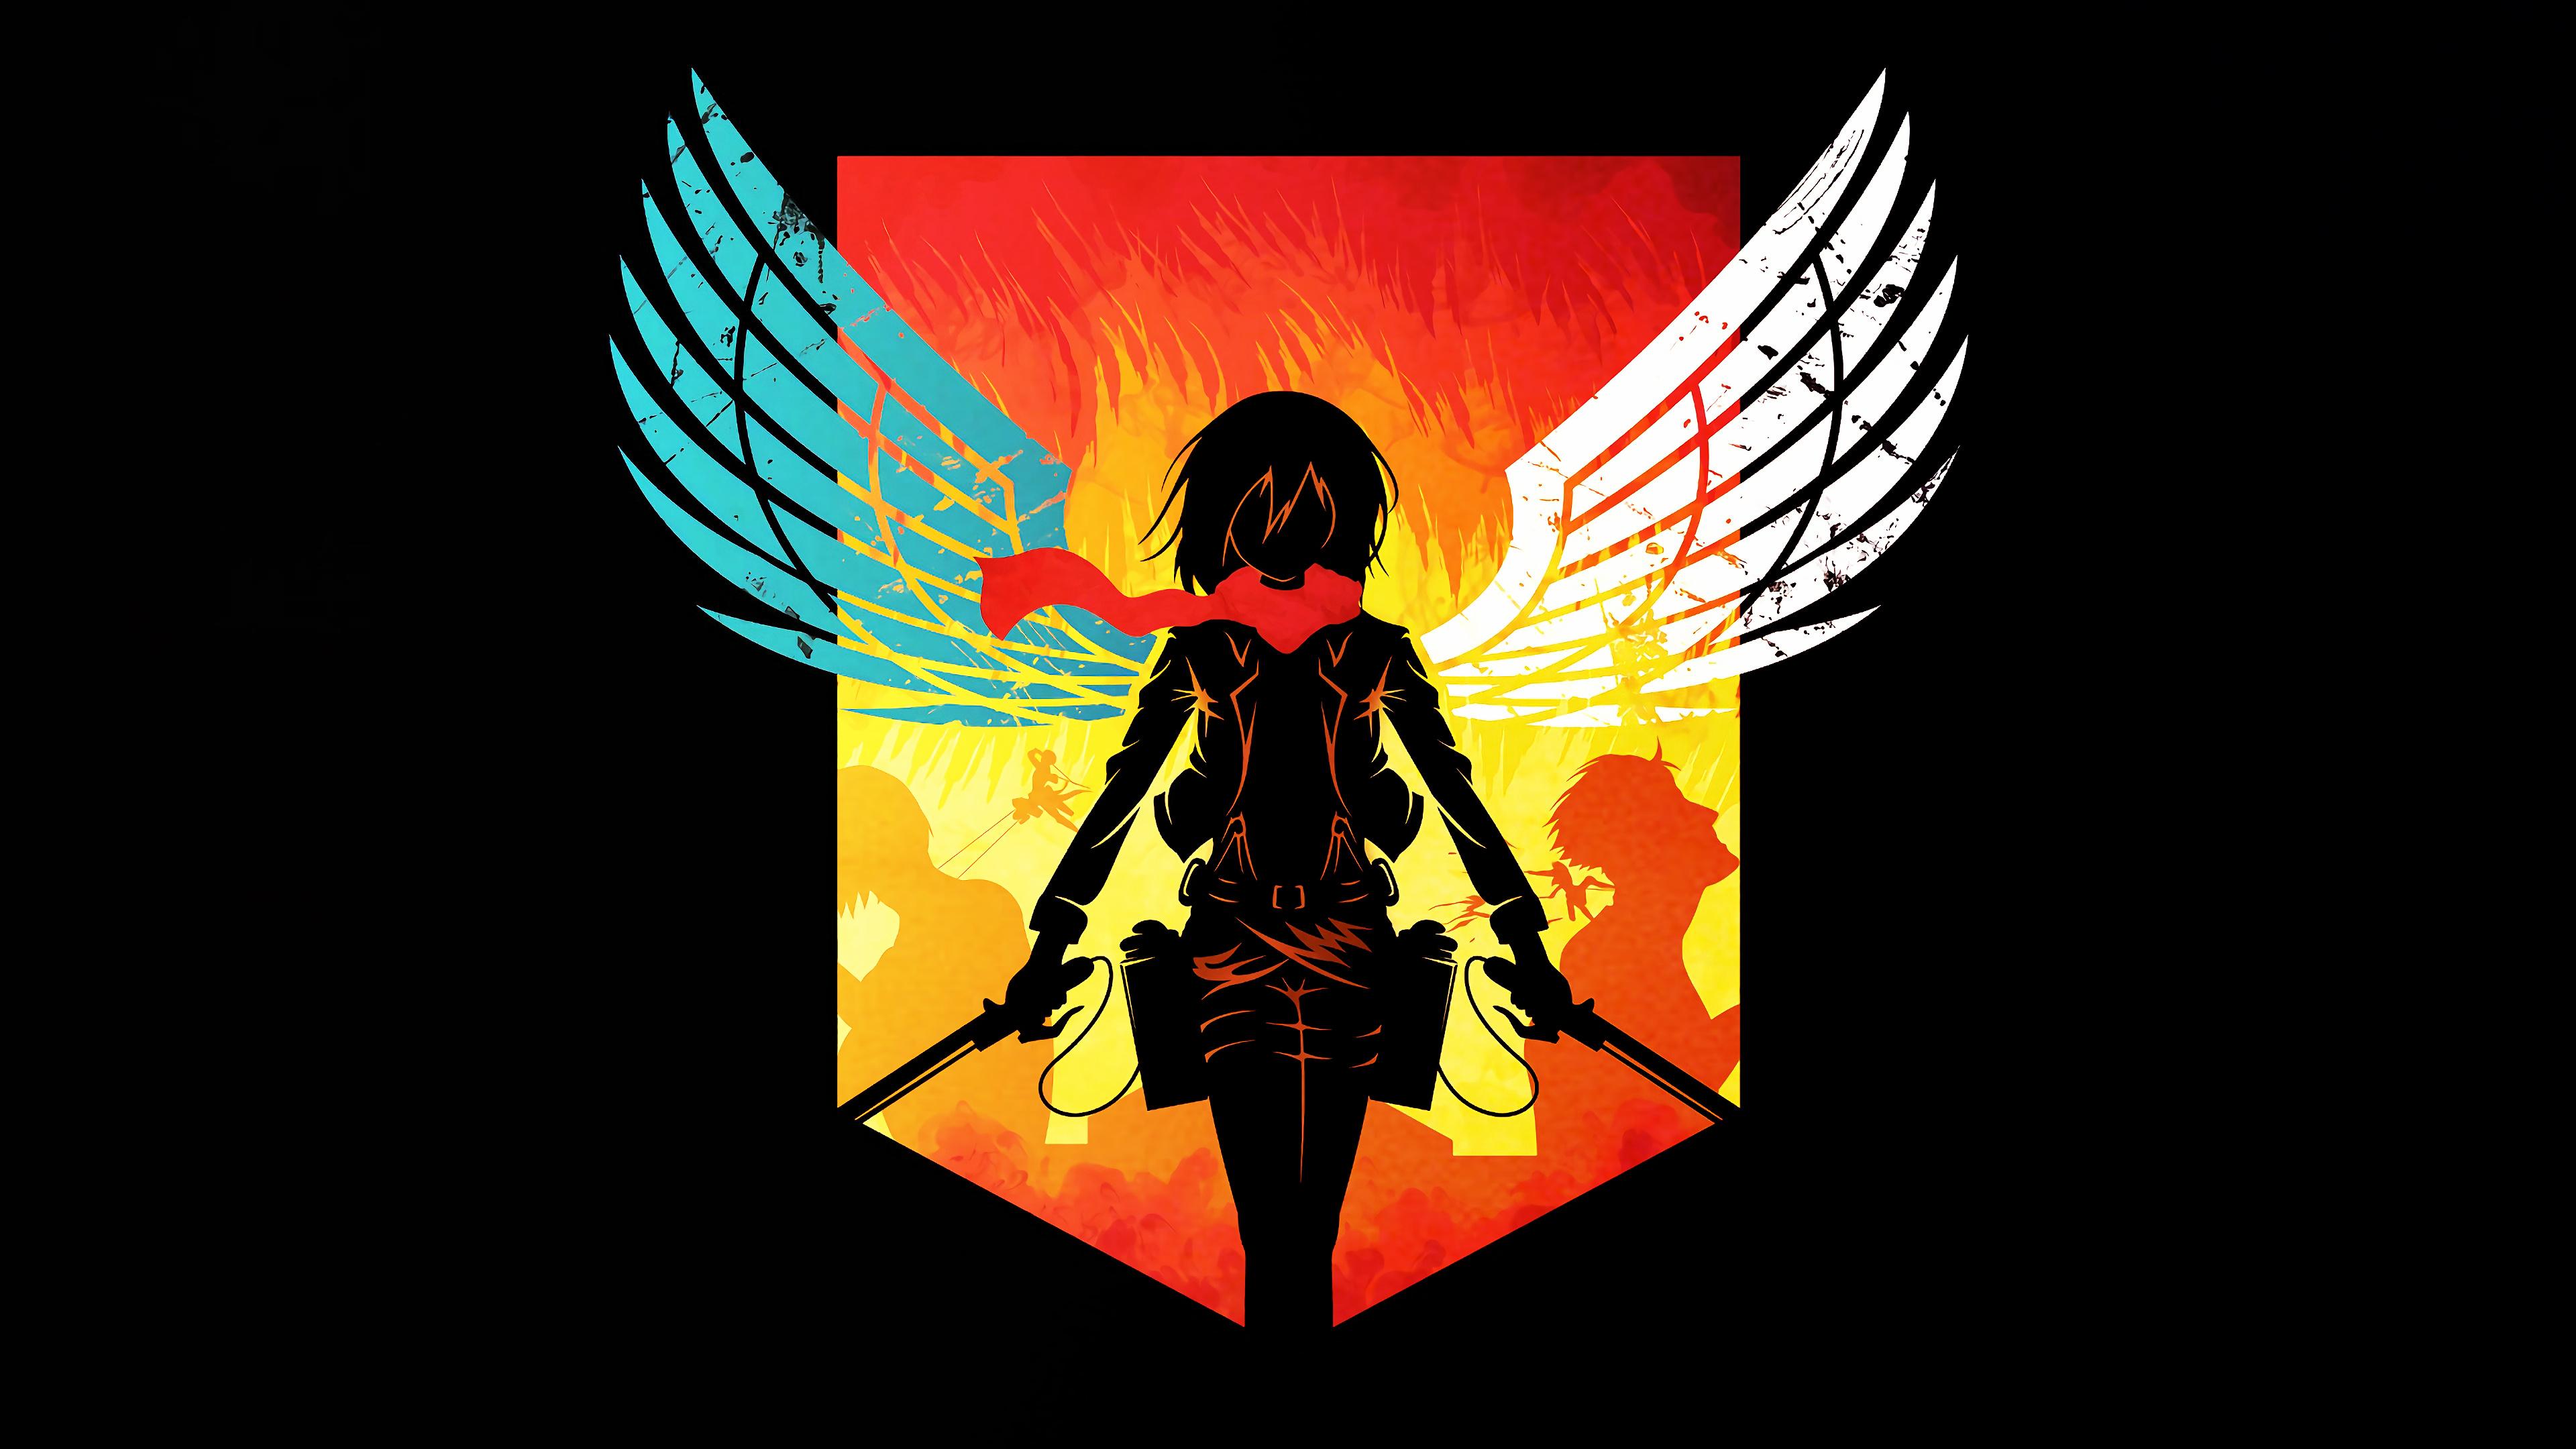 Attack on titan season 4 wallpaper · aot wallpaper garrison regiment. Attack on Titan 4K Wallpaper, Shingeki no Kyojin, Mikasa ...